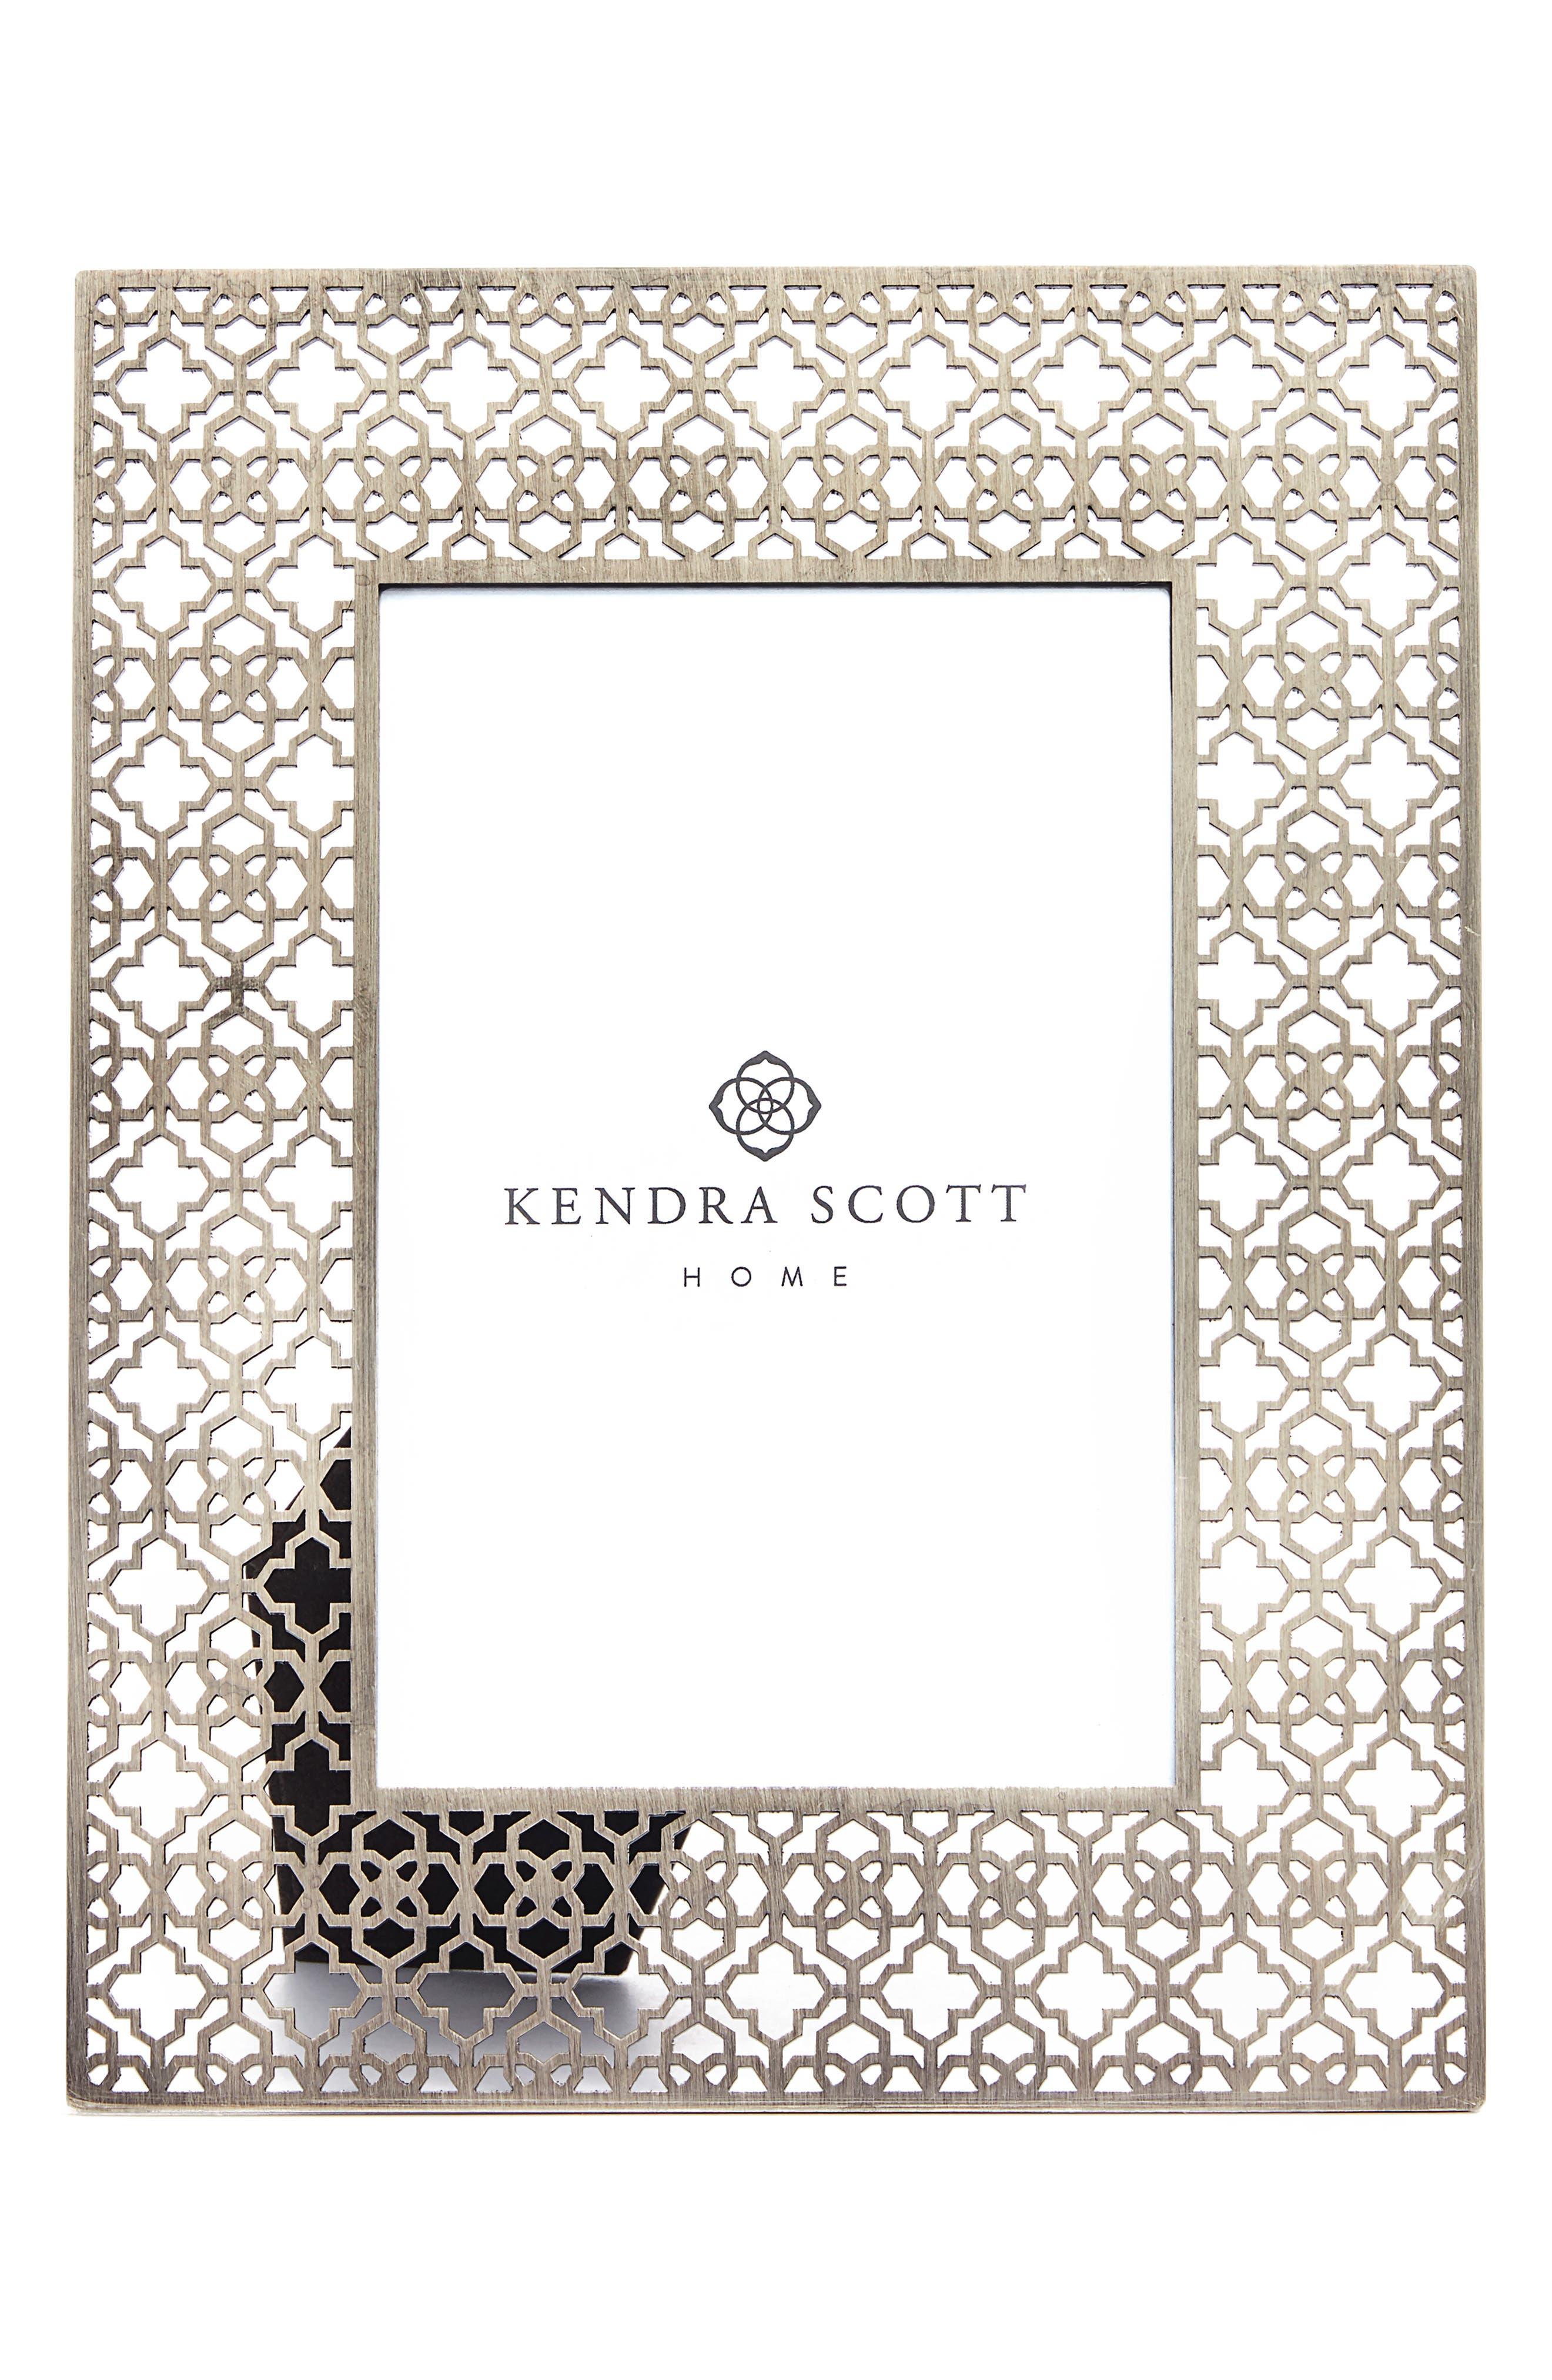 Kendra Scott Filigree Picture Frame